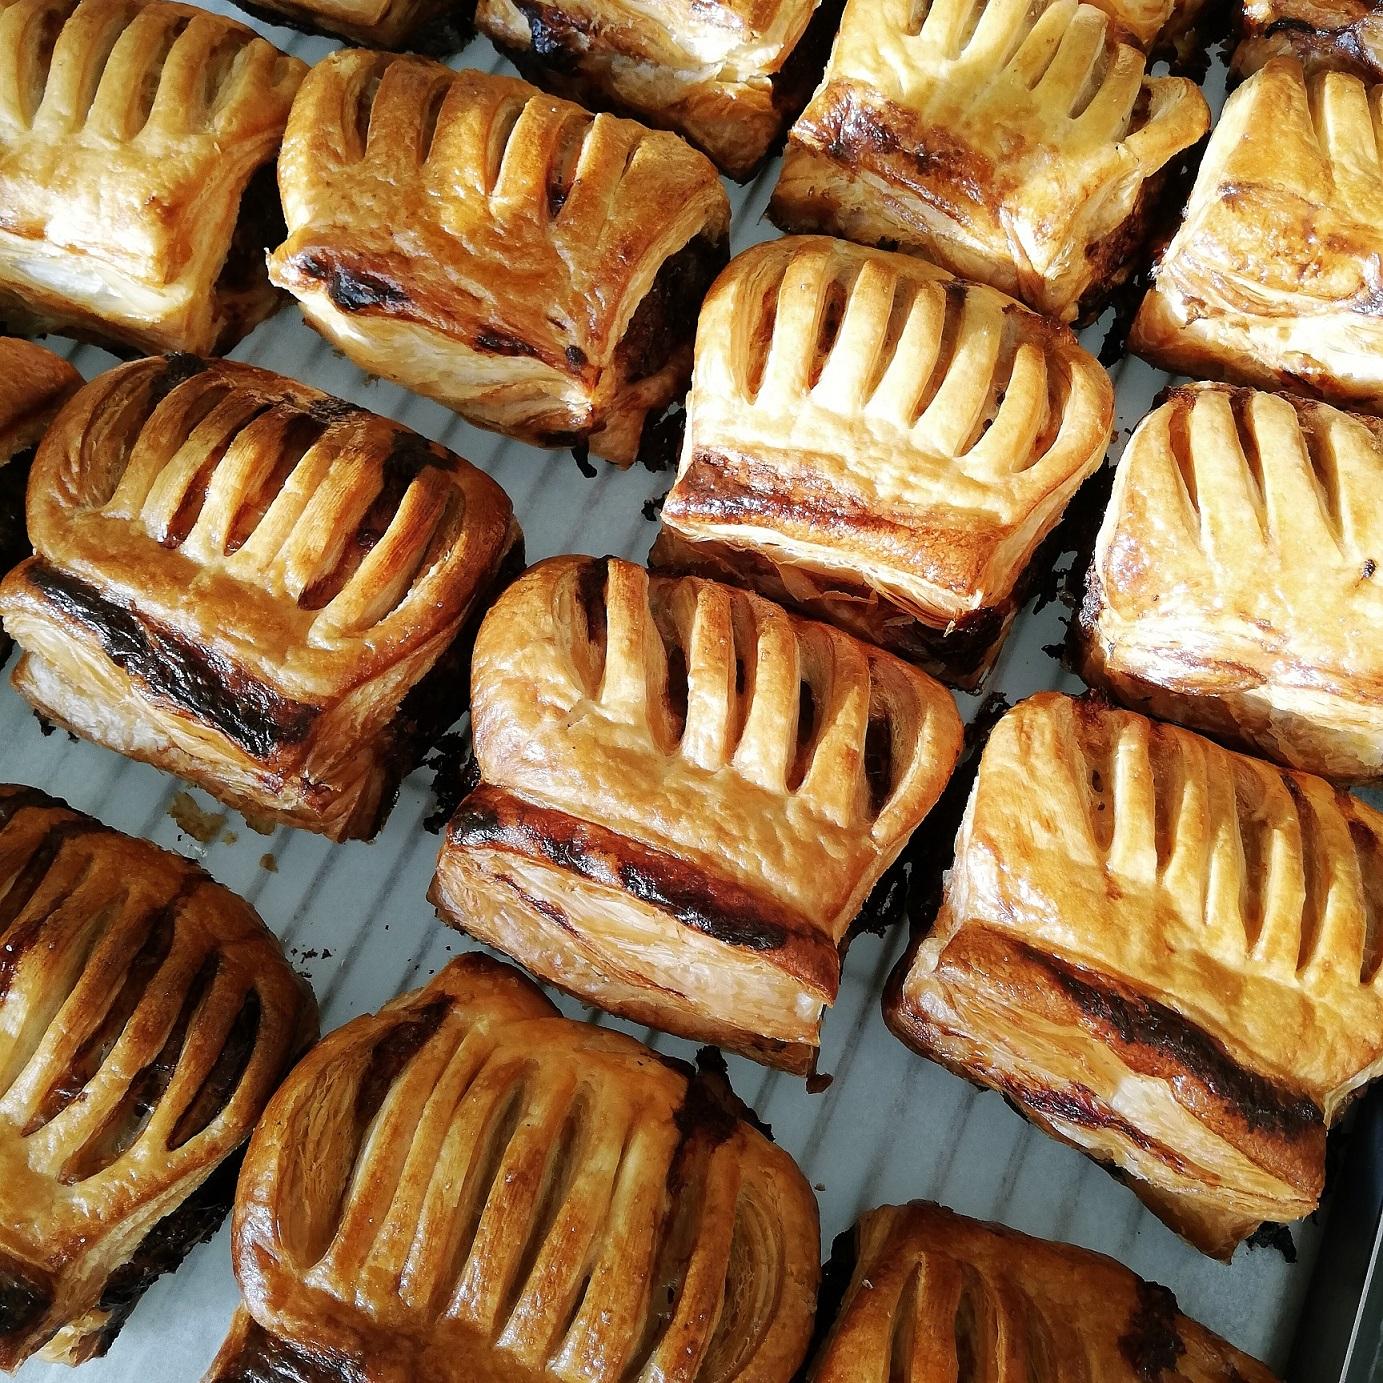 (FRI) Tuscan-Style Sausage Roll